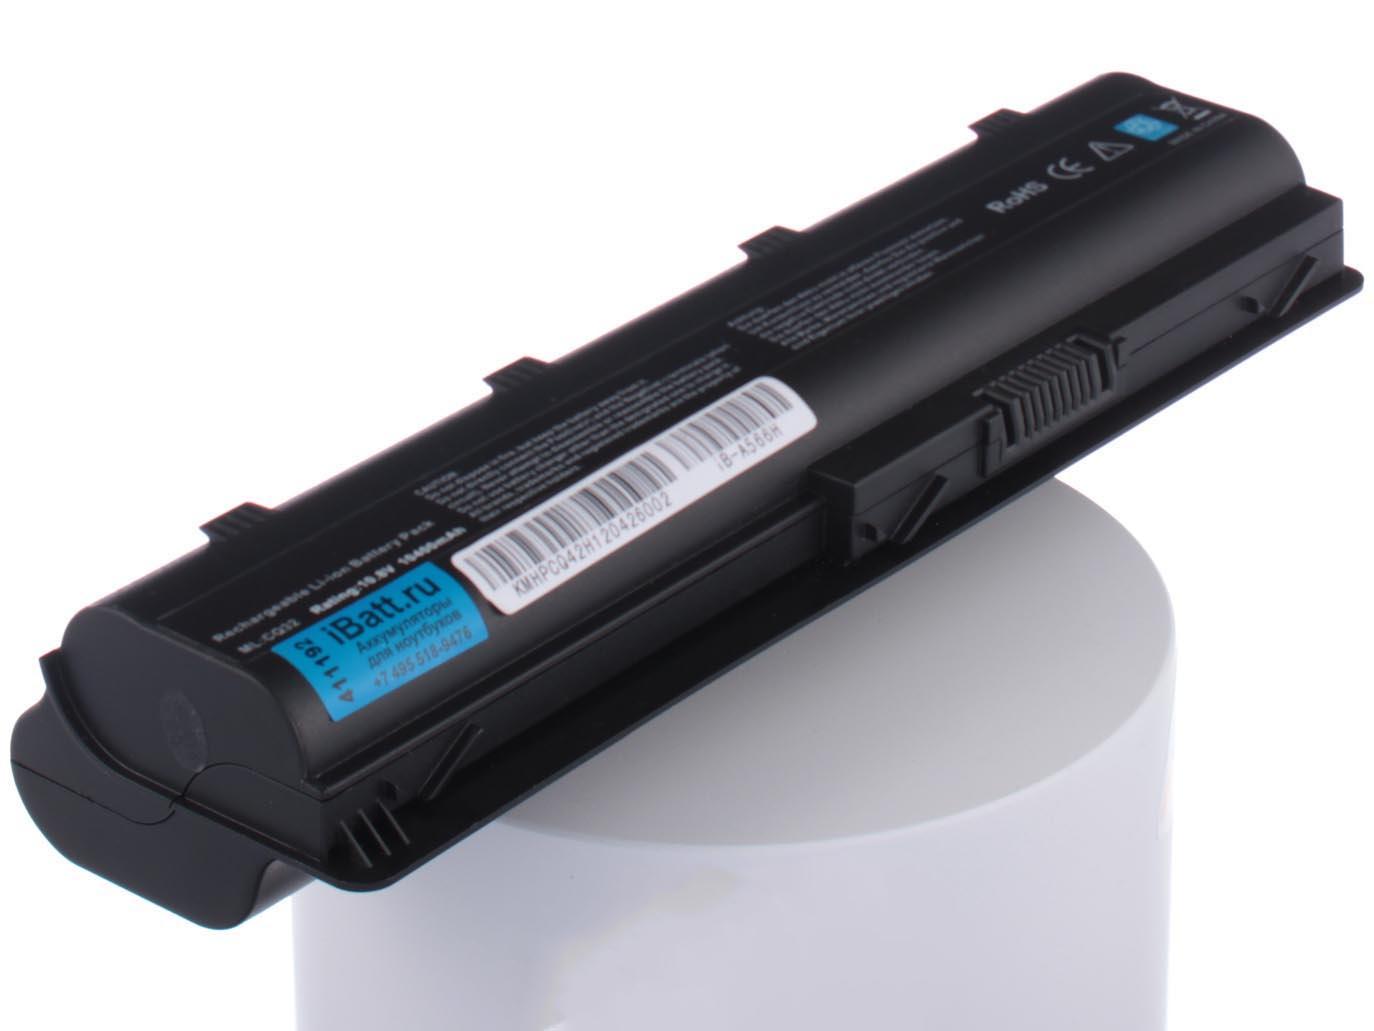 Аккумулятор для ноутбука iBatt для HP-Compaq Pavilion g6-1077sr, Pavilion g6-1250se, Pavilion g6-2182er, Pavilion g6-2235ew, Pavilion g6-2236er, Pavilion g7-1226er, Pavilion g7-2116sr, Presario CQ32, CQ58-375SR 638856 001 da0r22mb6d1 d0 fit for hp pavilion g4 g6 g7 notebook motherboard tested working